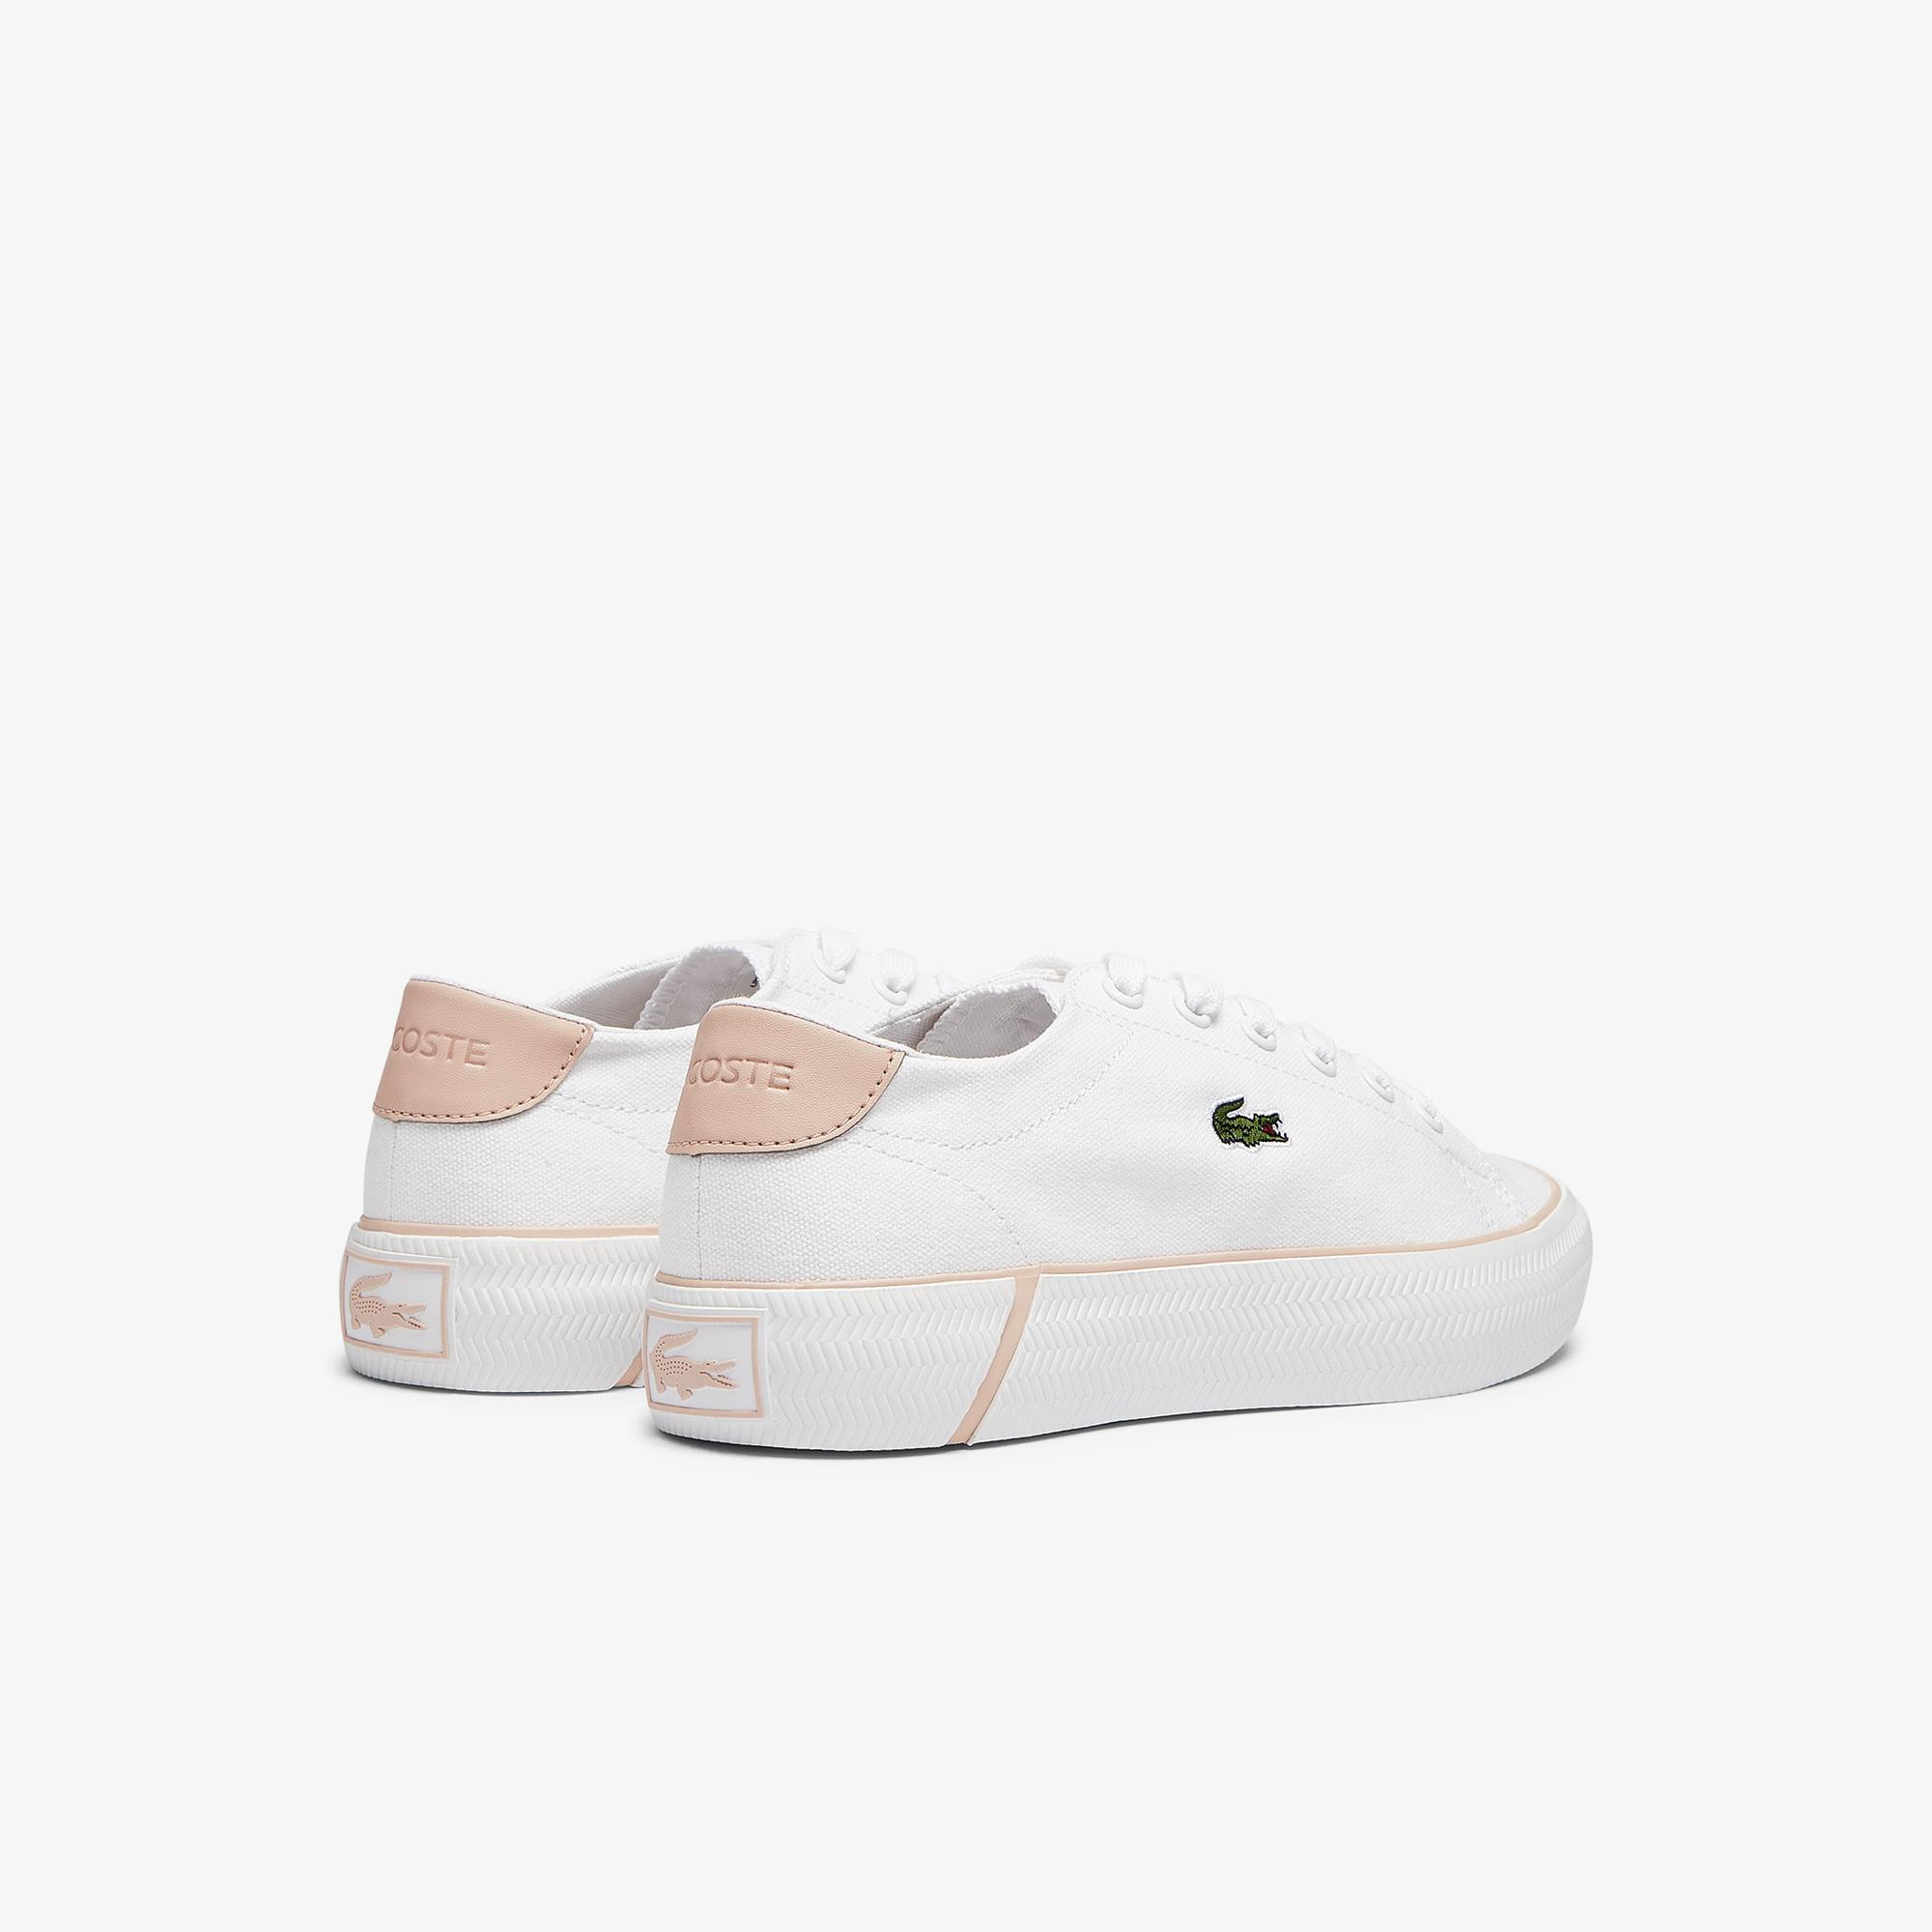 Lacoste Women's Grıpshot Bl 21 2 Cfa Shoes